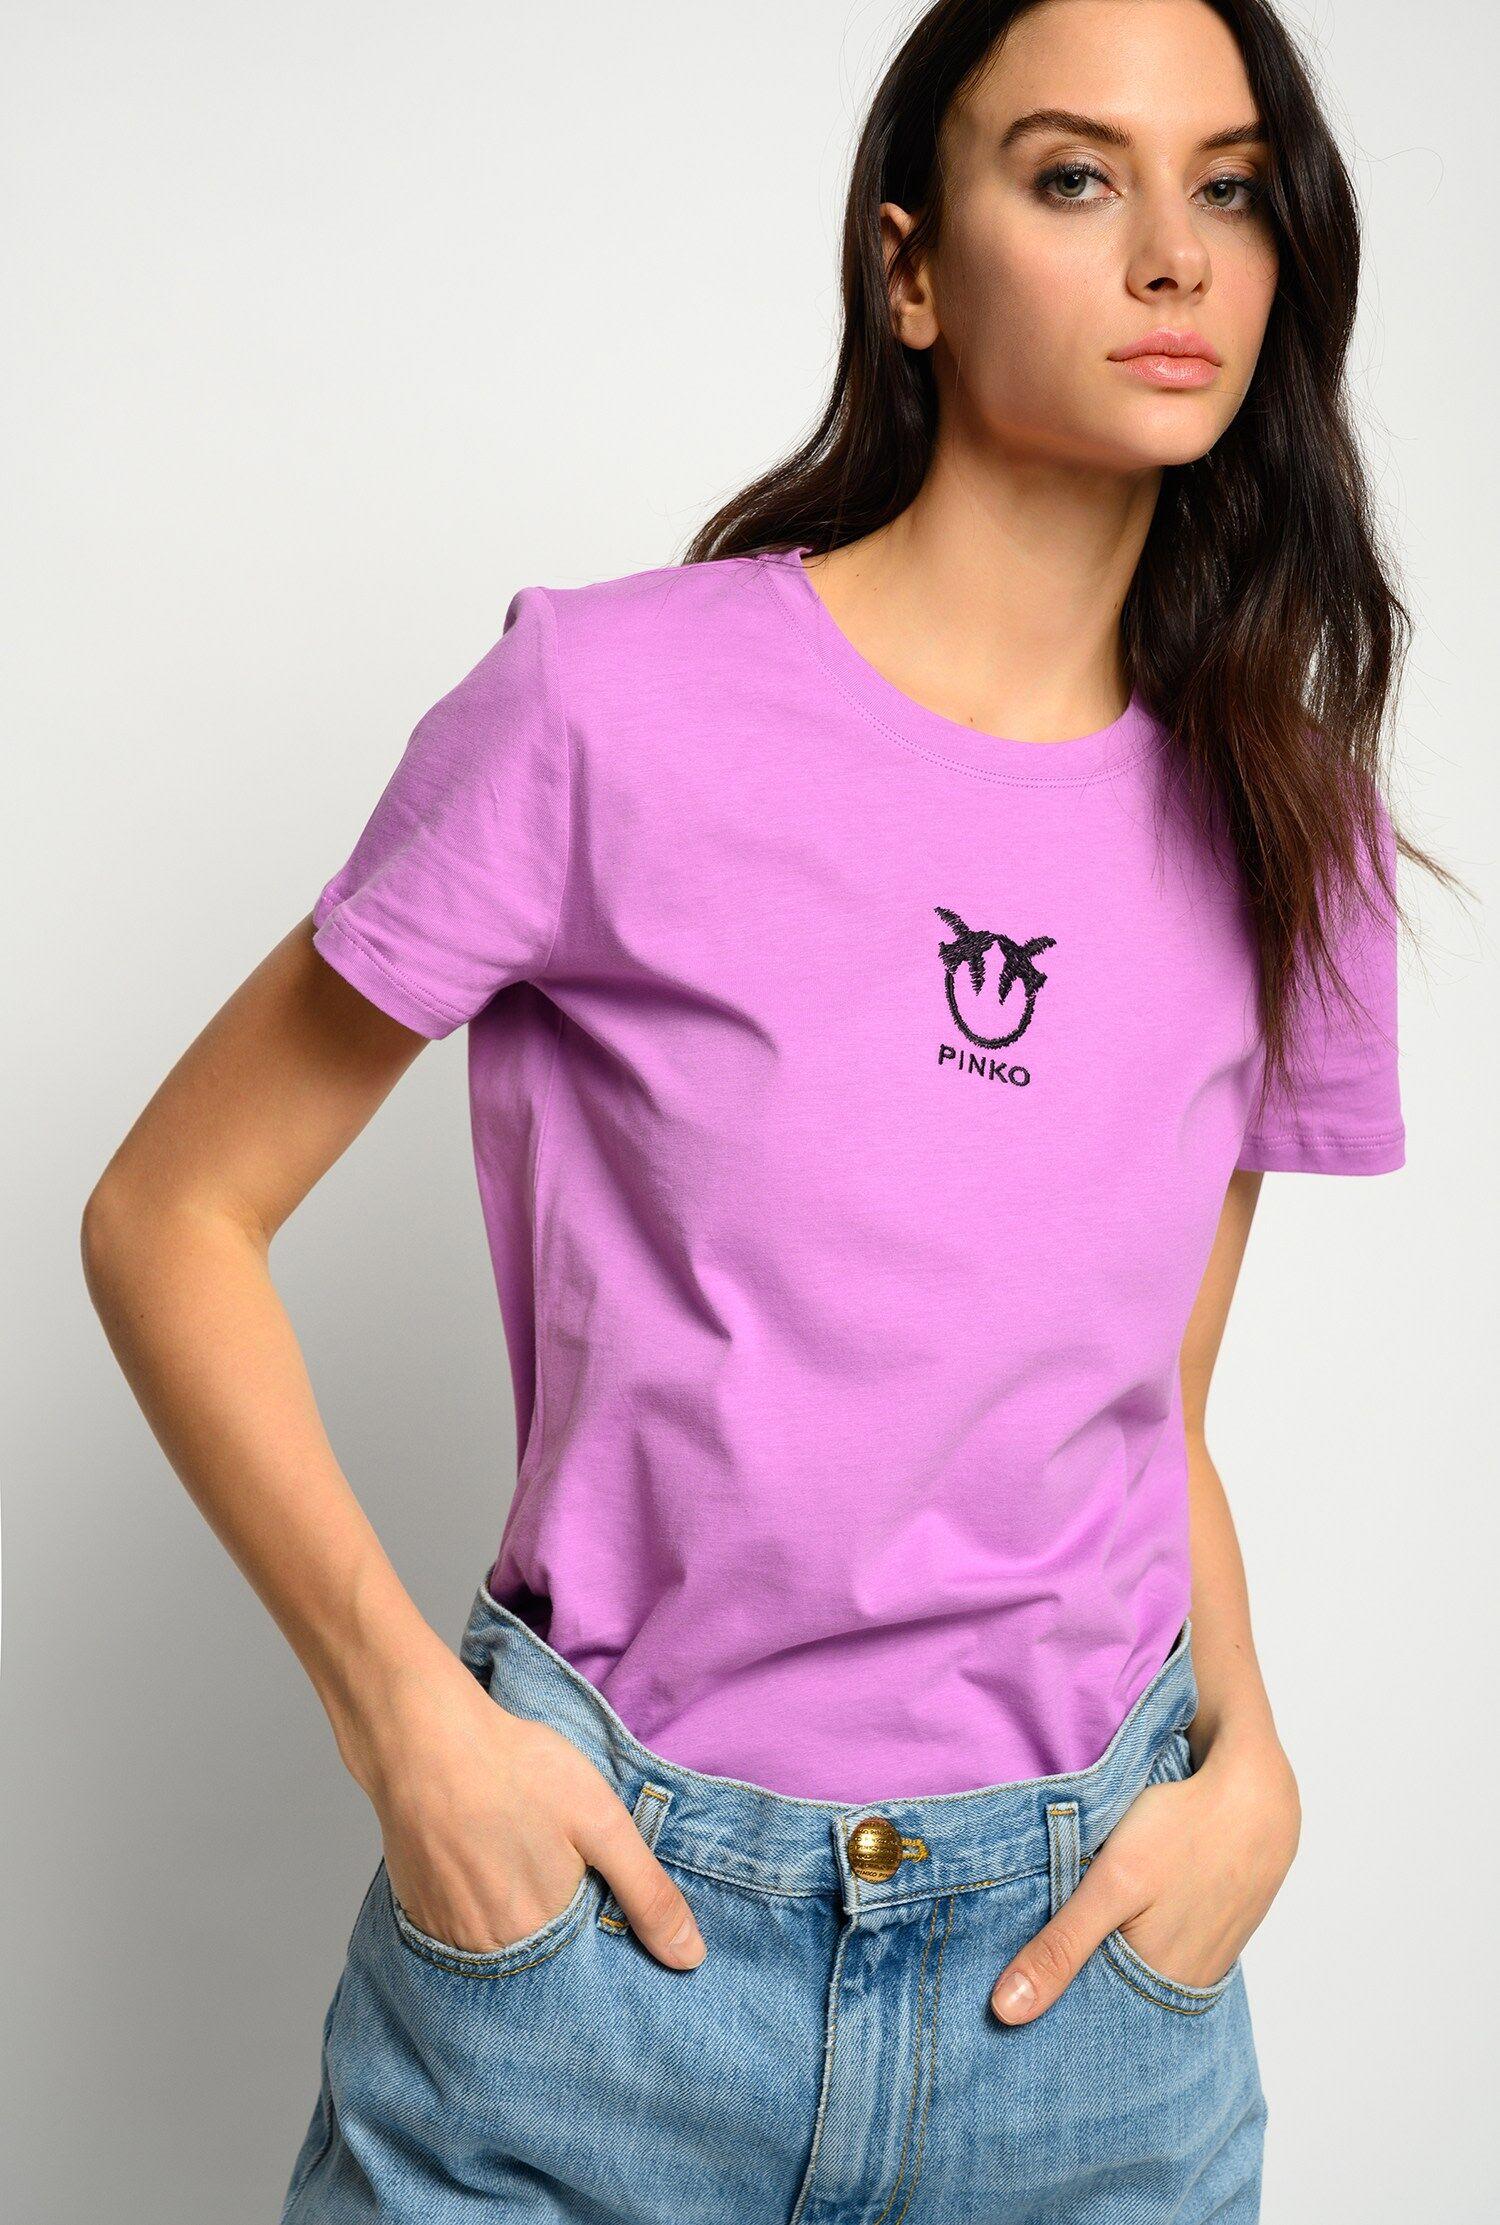 T Shirt Logo Love Birds - Pinko